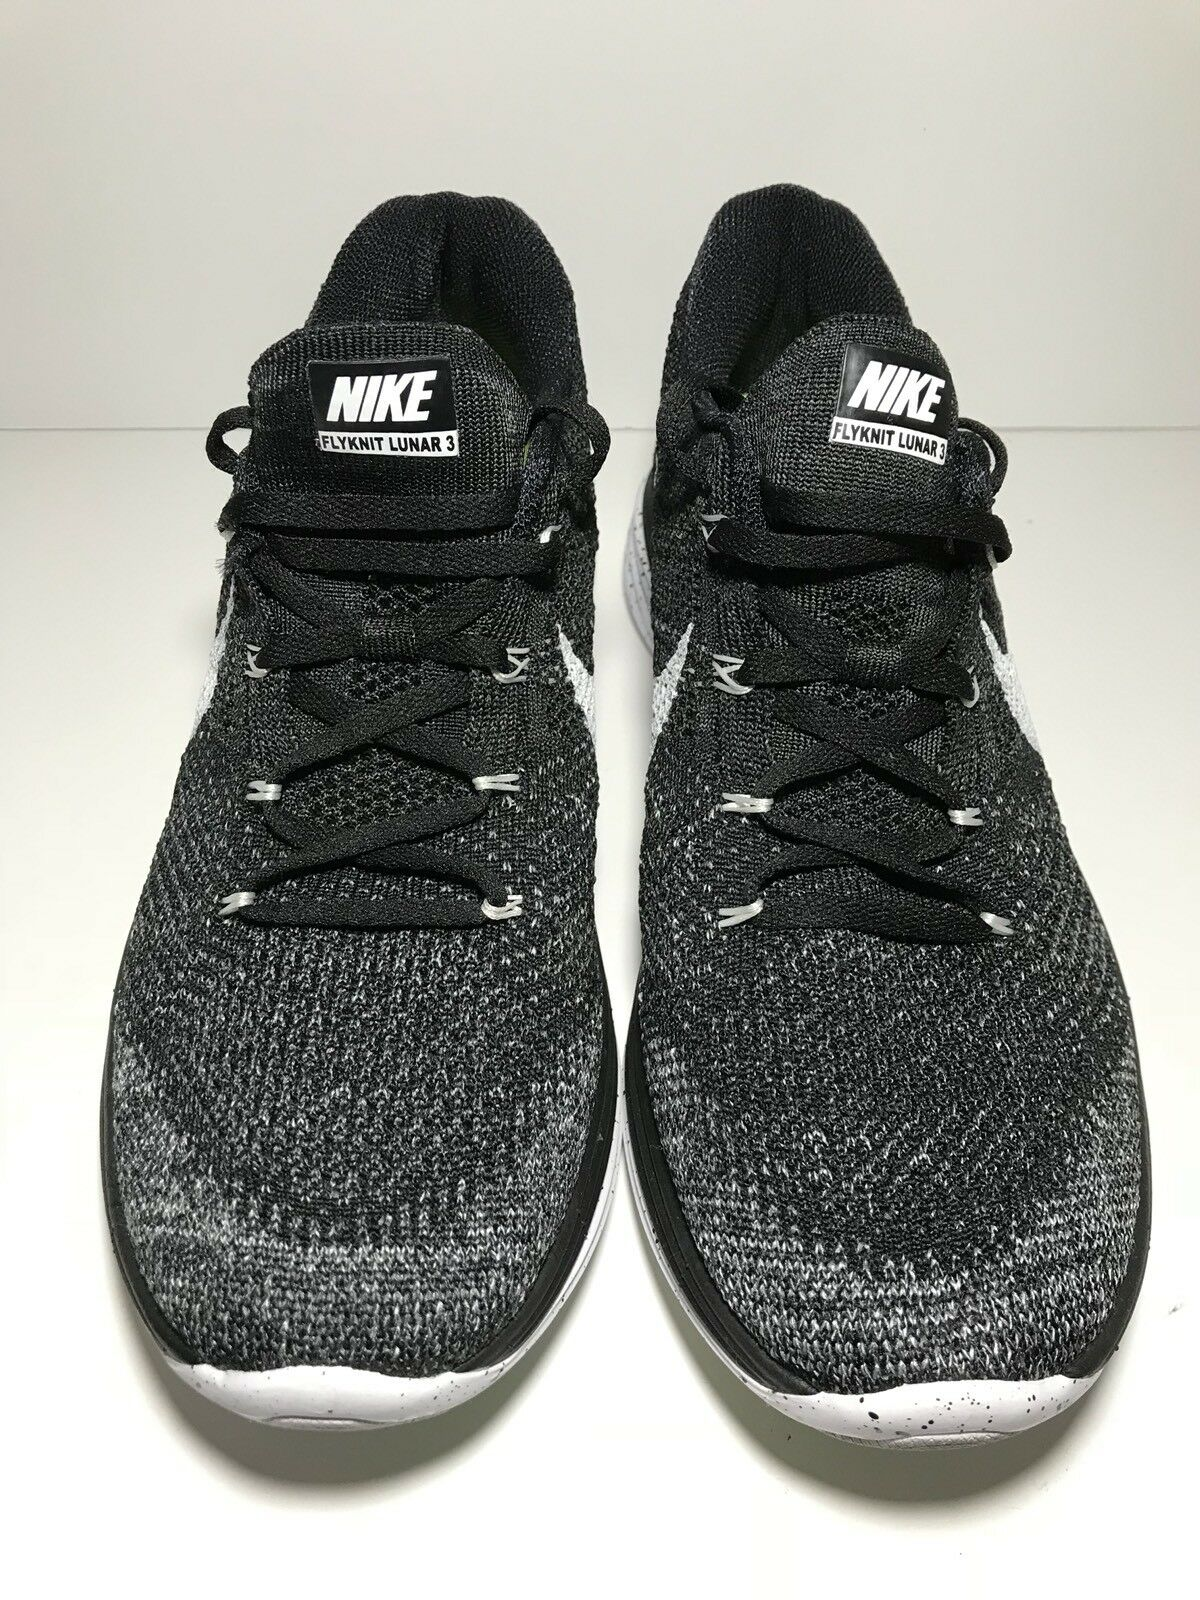 Nike Flyknit Lunar 3 OREO Running Shoes 698181-010 Black White Men Size 9.5